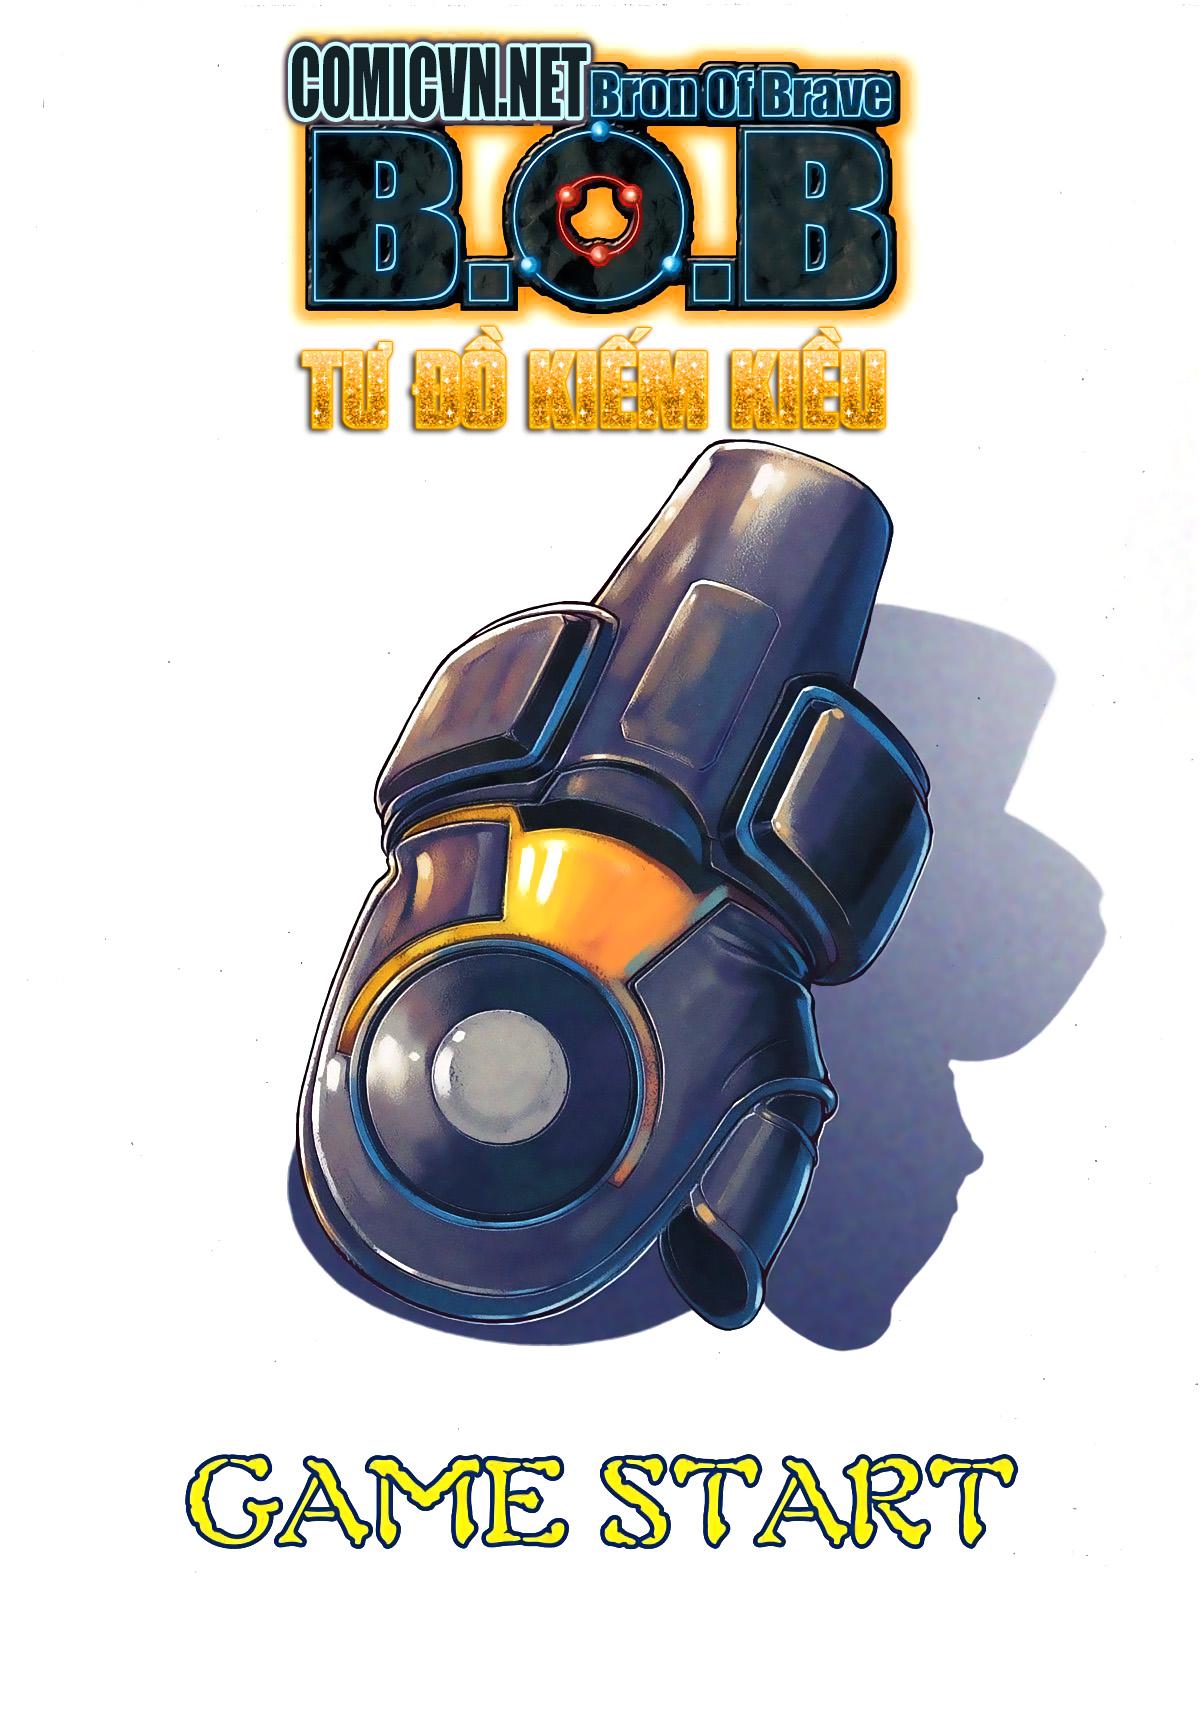 xem truyen moi - BRON OF BRAVE (Tái Tạo Không Gian) - Chapter 16: Game Start 2